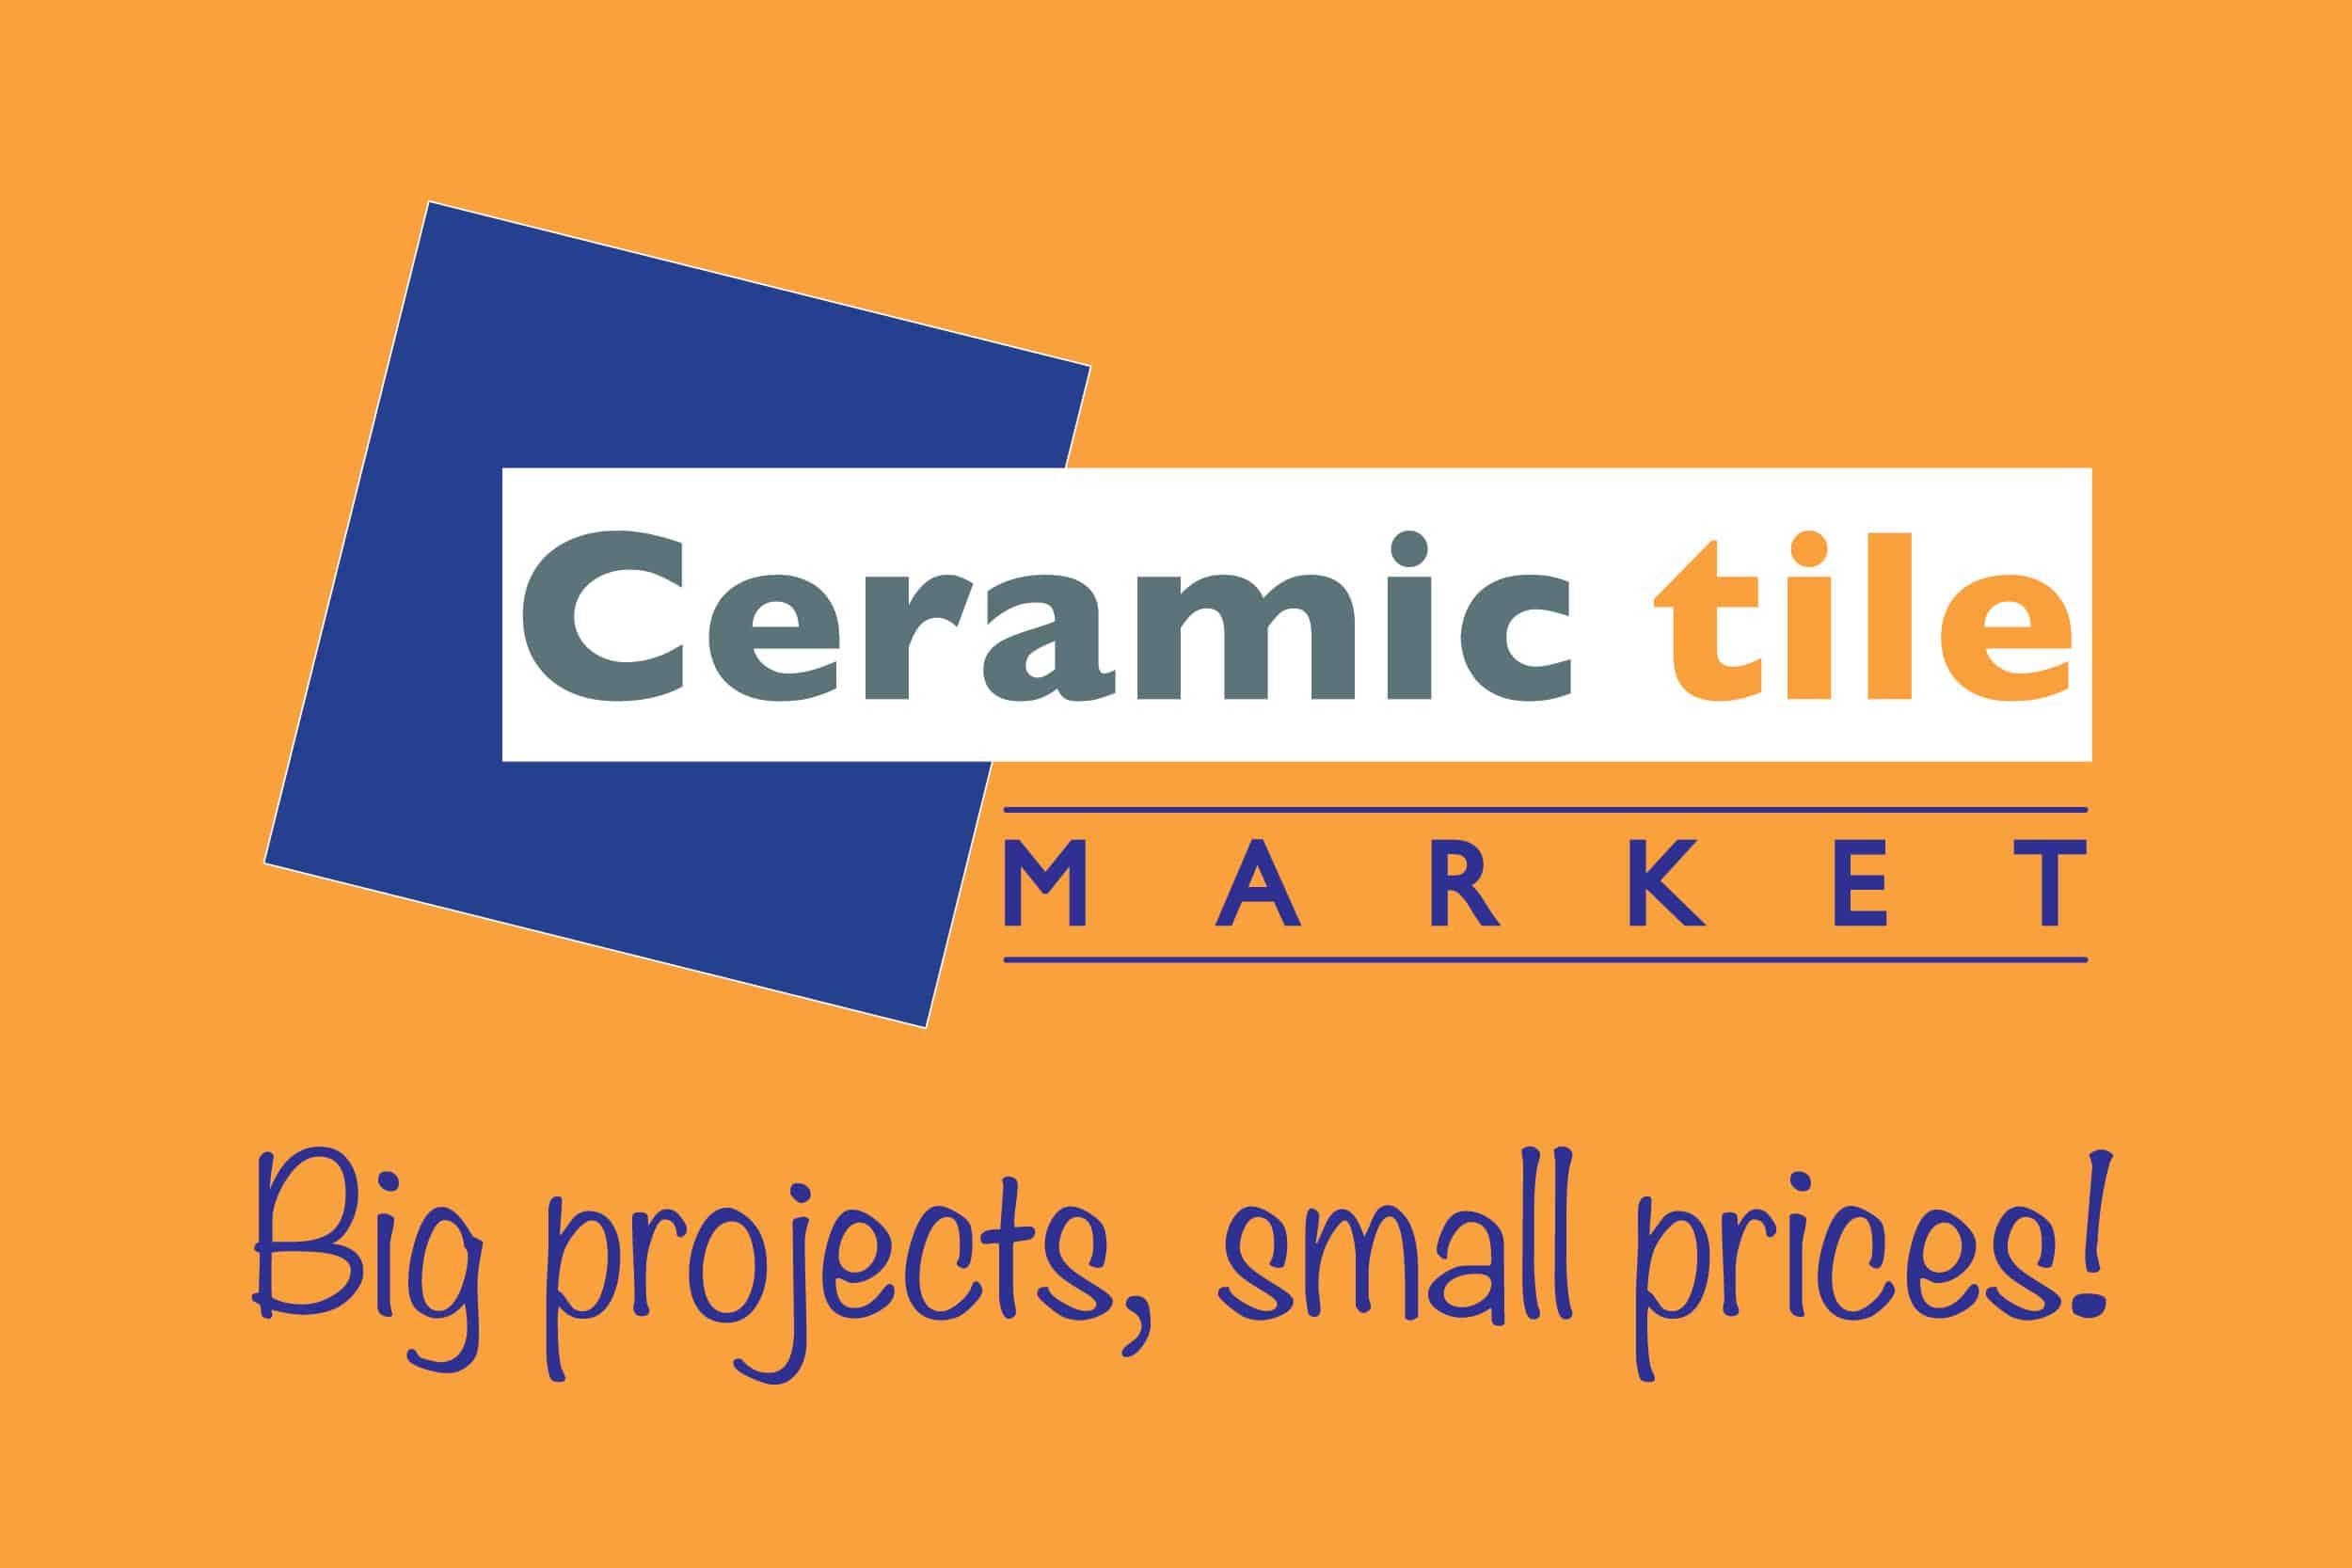 emc tiles ceramic tile market adhesives, tiling tools, floor wall tiles, clearance, underfloor heating